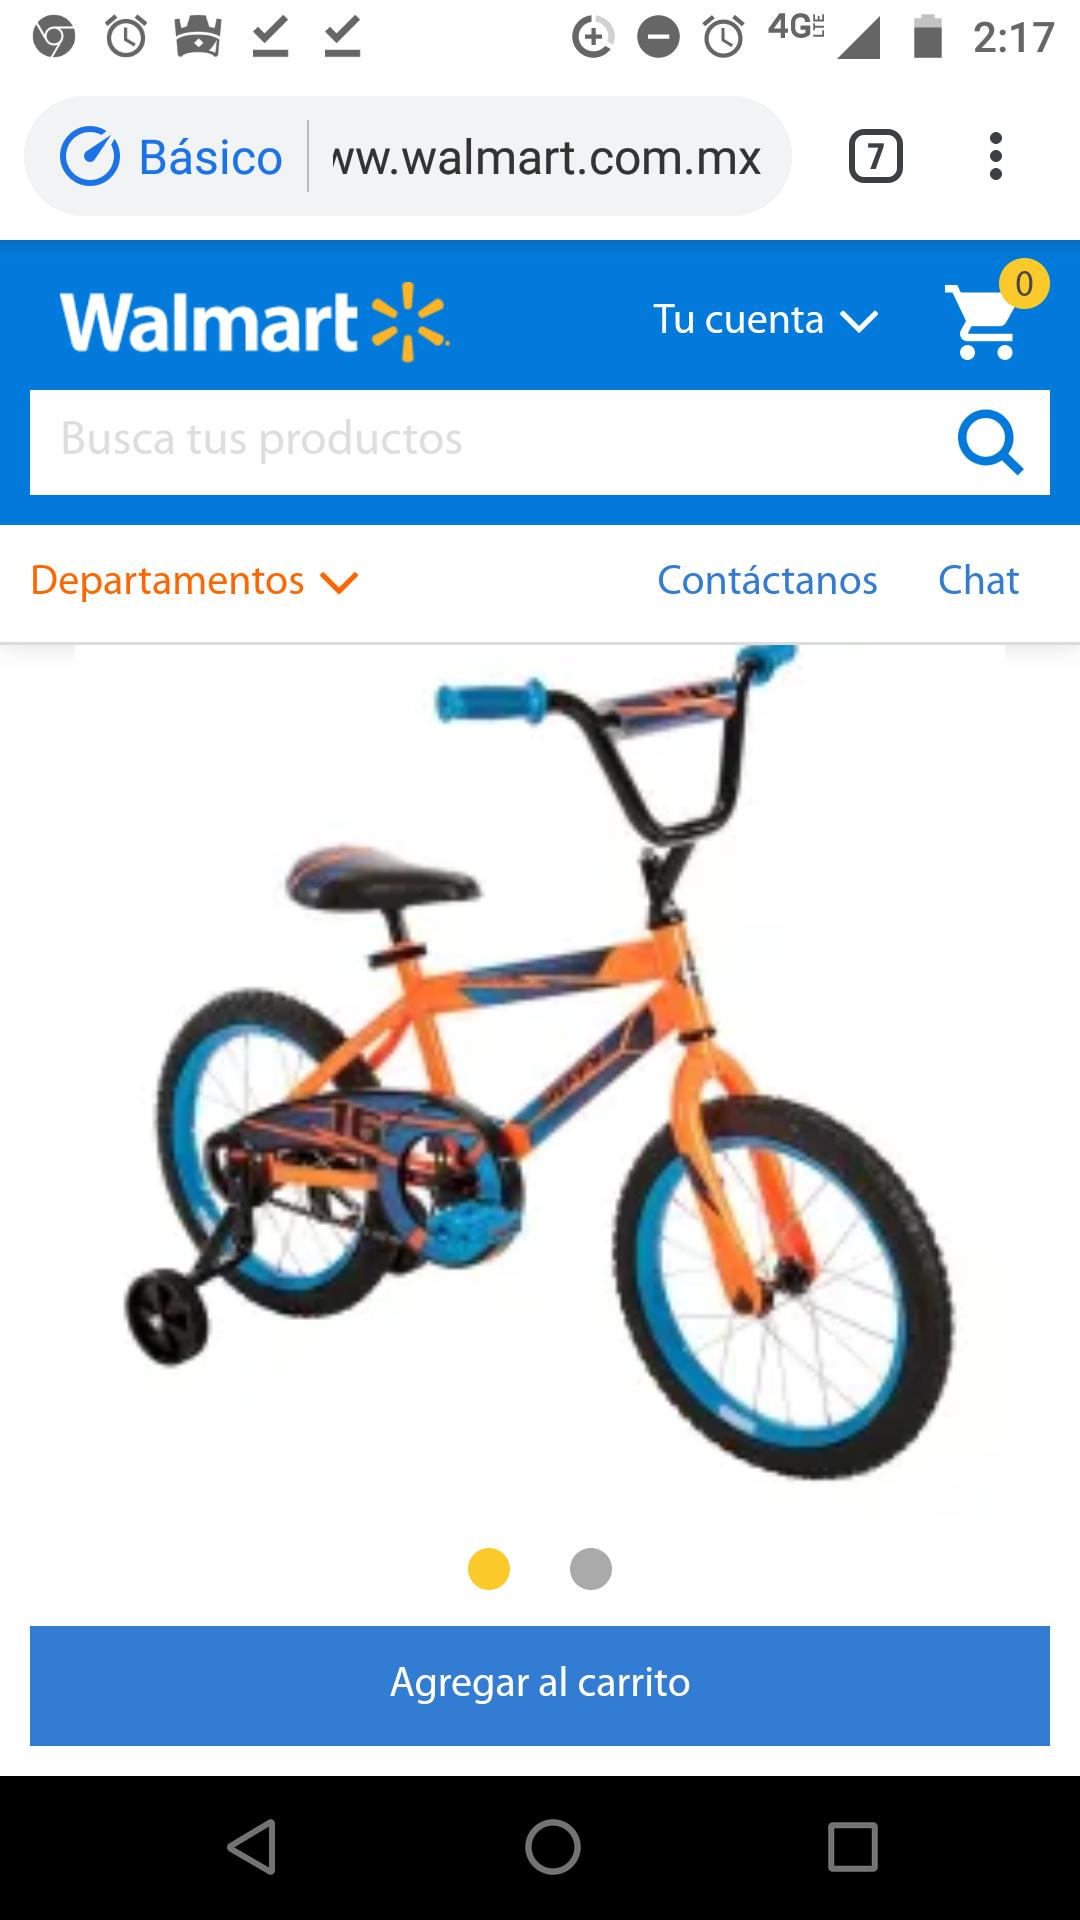 Walmart: Bicicleta Huffy Pro Thunder Rodada 16